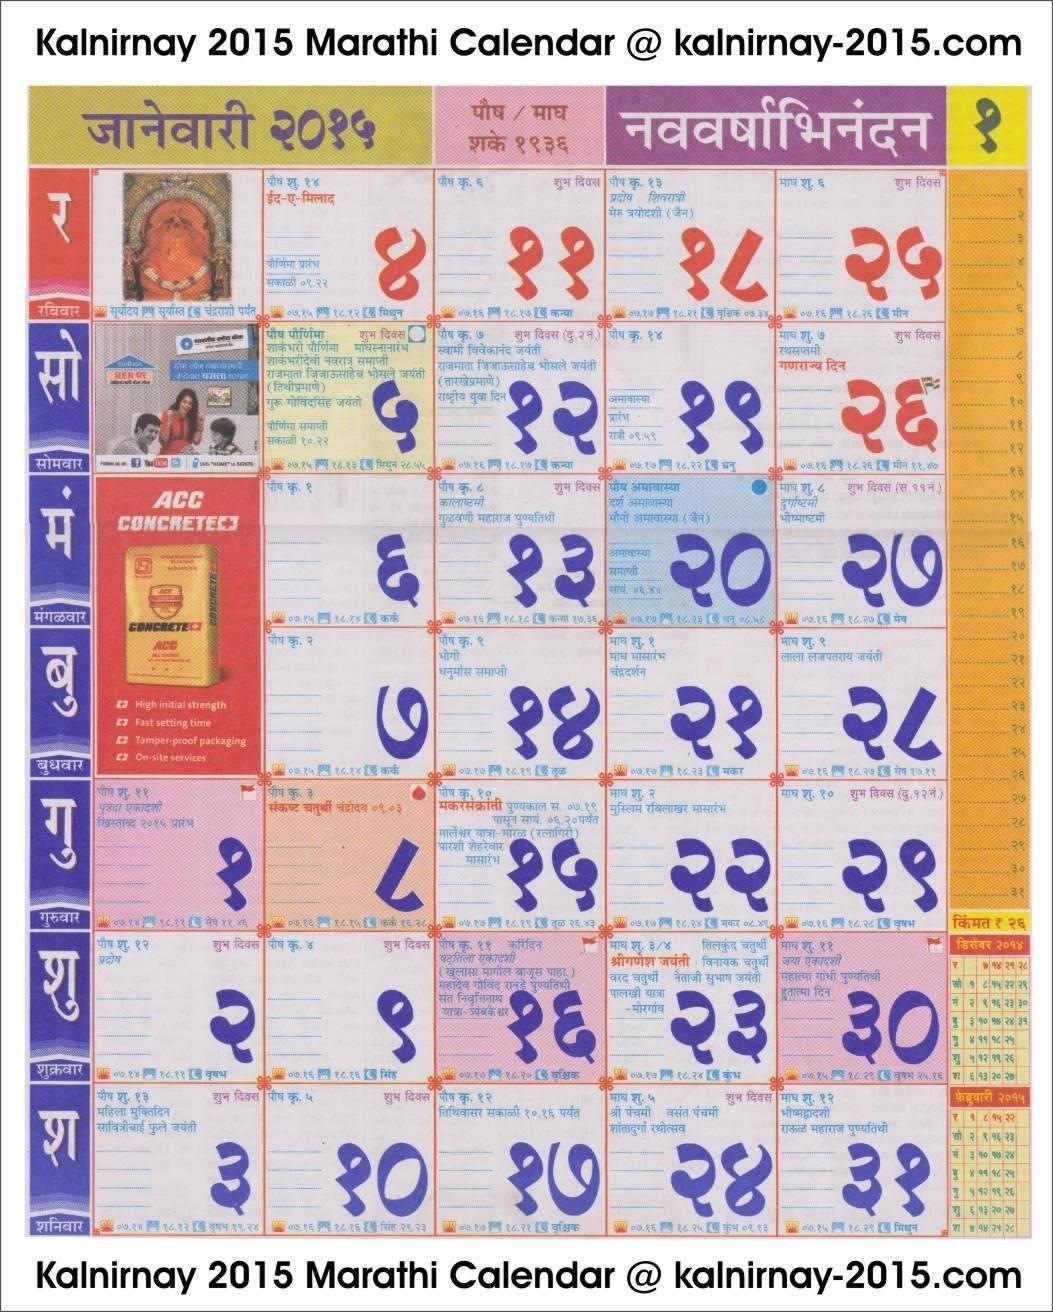 January 2015 Marathi Kalnirnay Calendar | 2015 Kalnirnay Marathi Calendar Of 2019 In Marathi